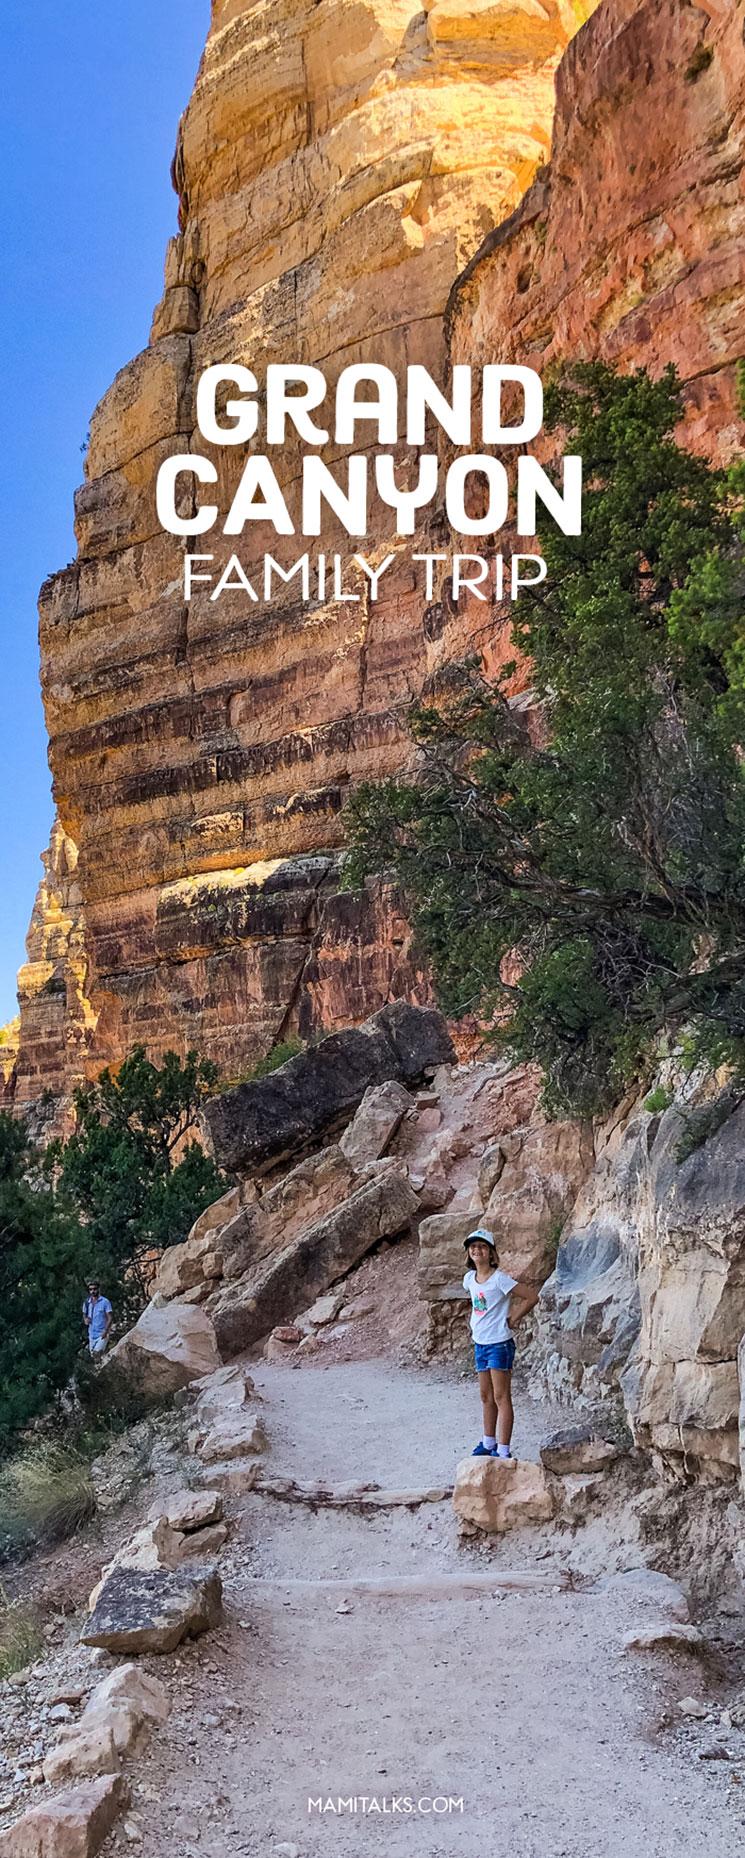 Grand Canyon hike South Rim, little girl hiking. -MamiTalks.com